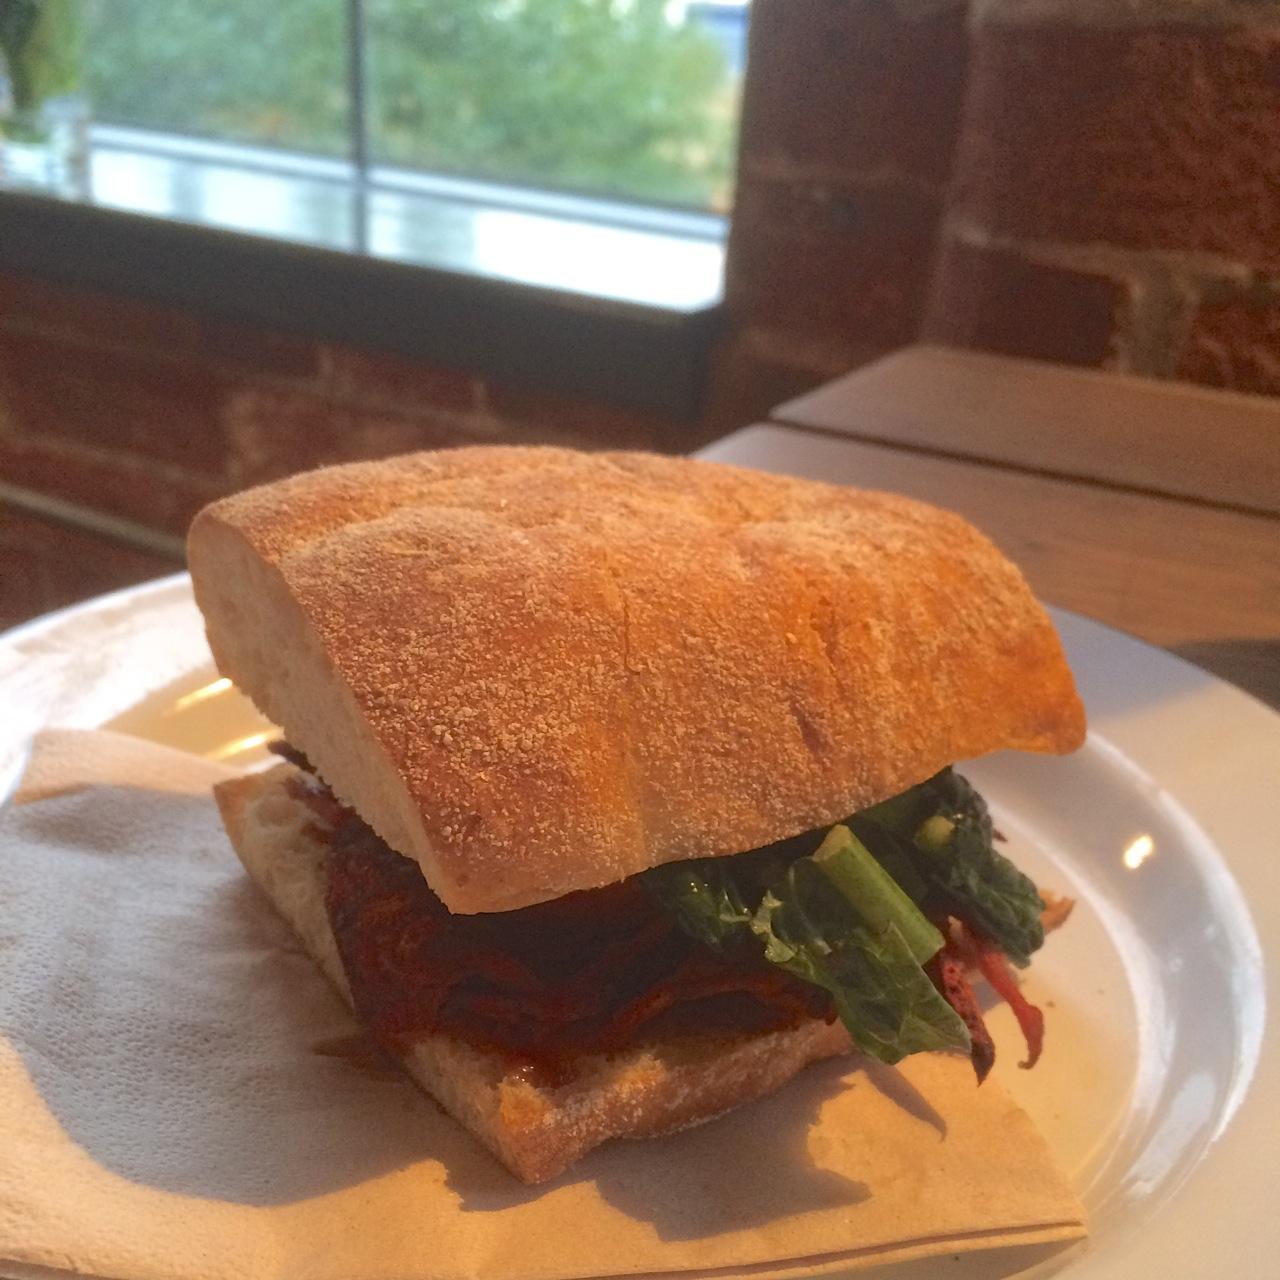 http://i0.wp.com/fatgayvegan.com/wp-content/uploads/2015/11/Sandwich-vegan.jpg?fit=1280%2C1280